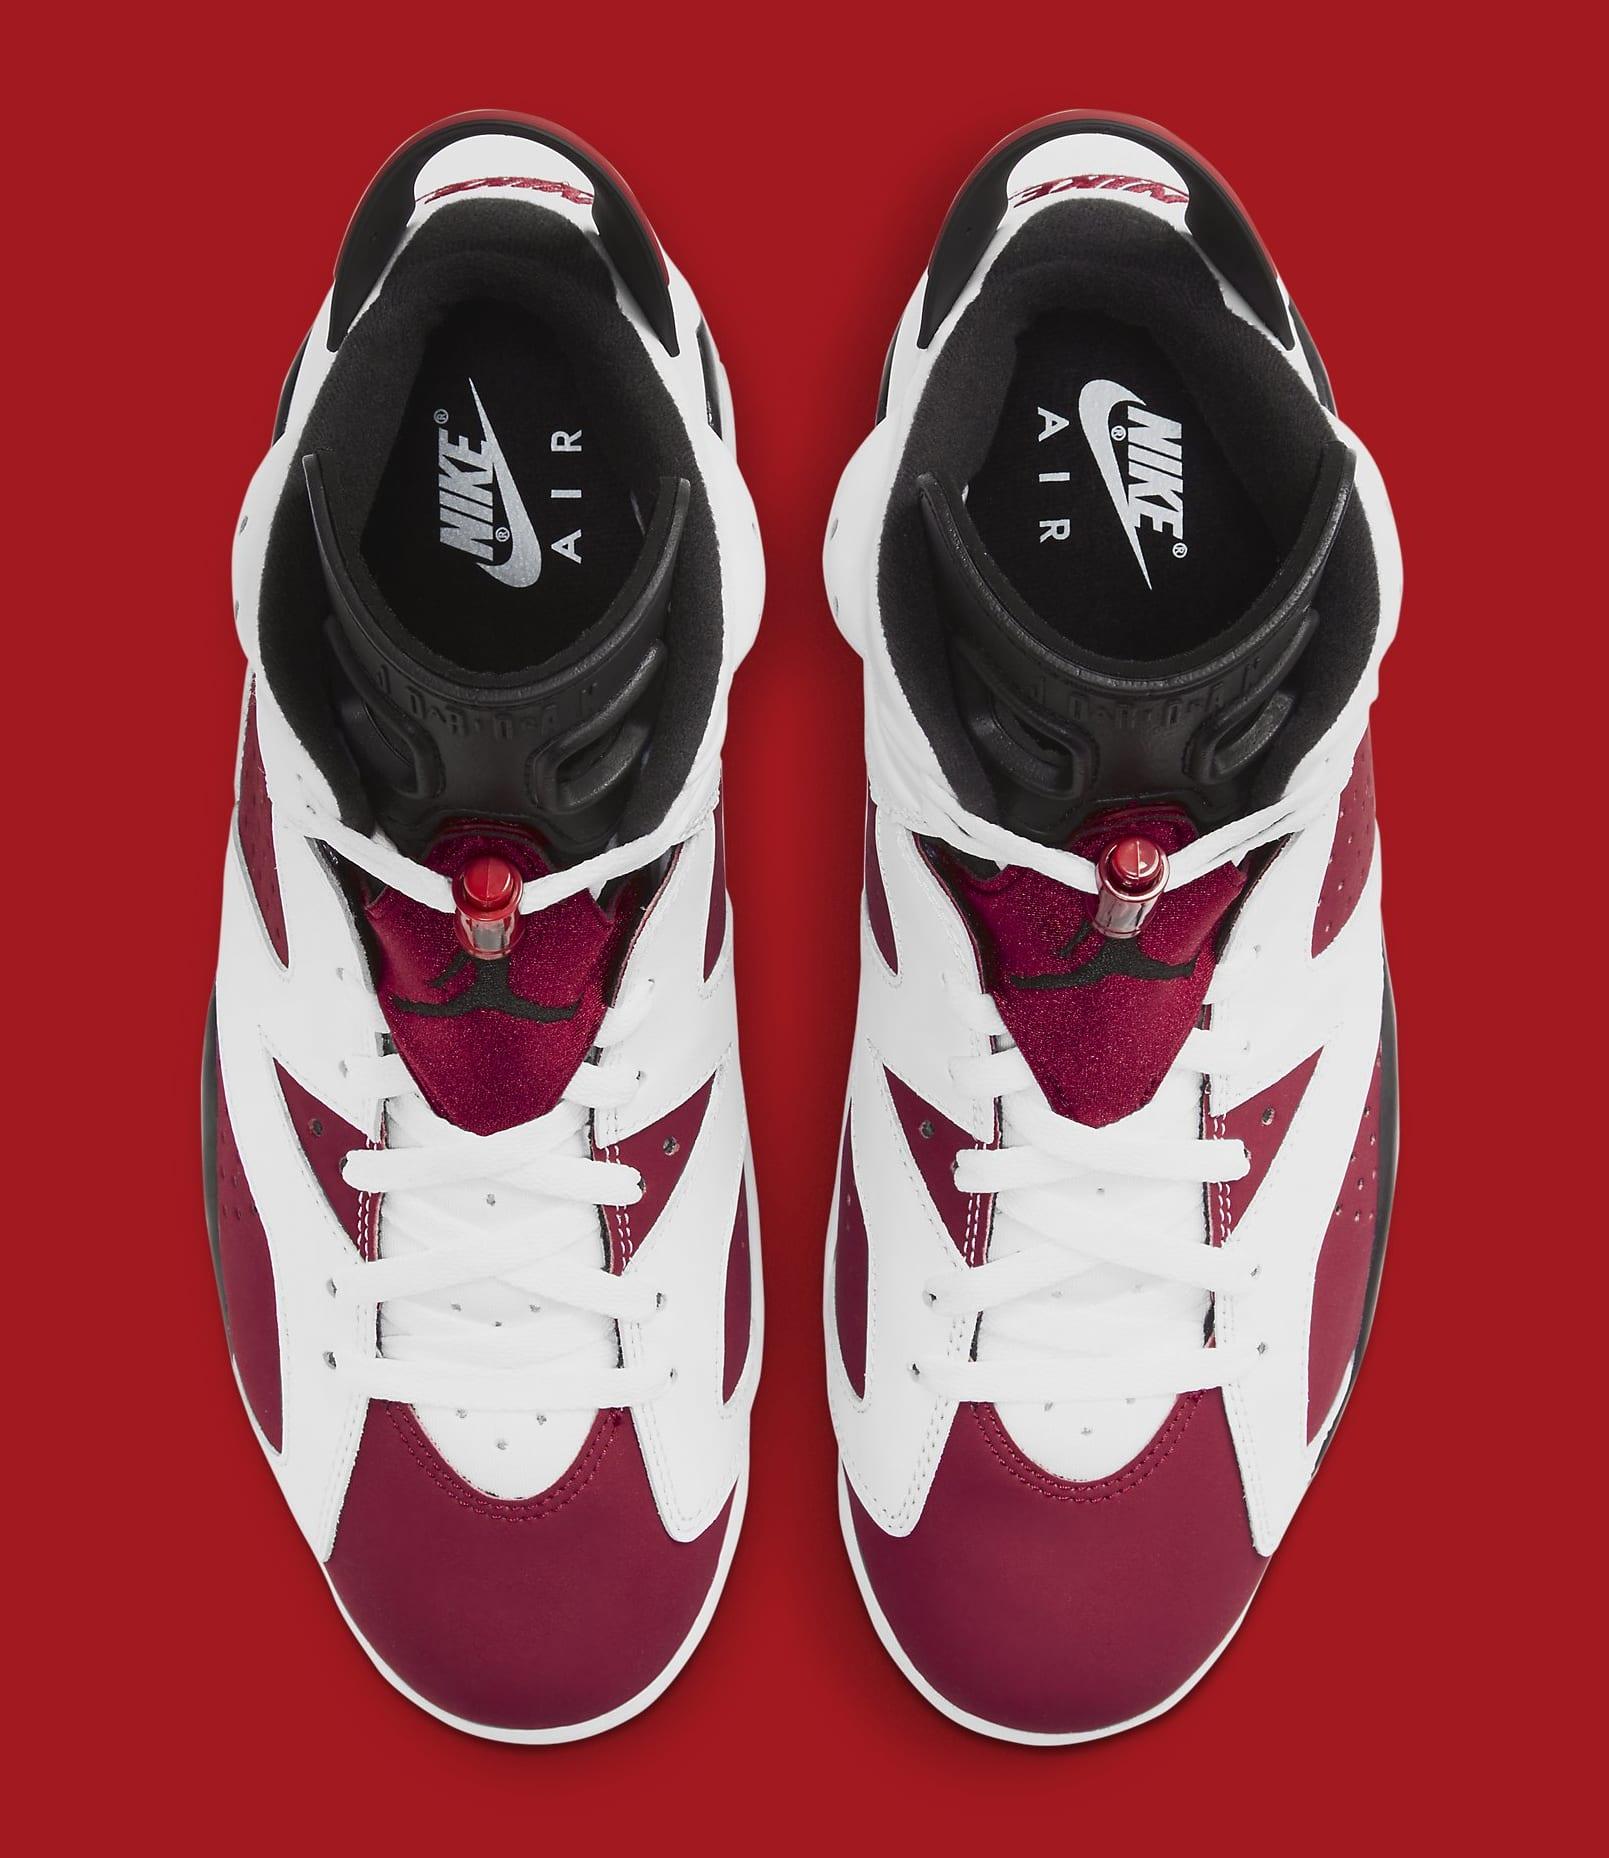 Air Jordan 6 Retro 'Carmine' 2021 CT8529-106 Top